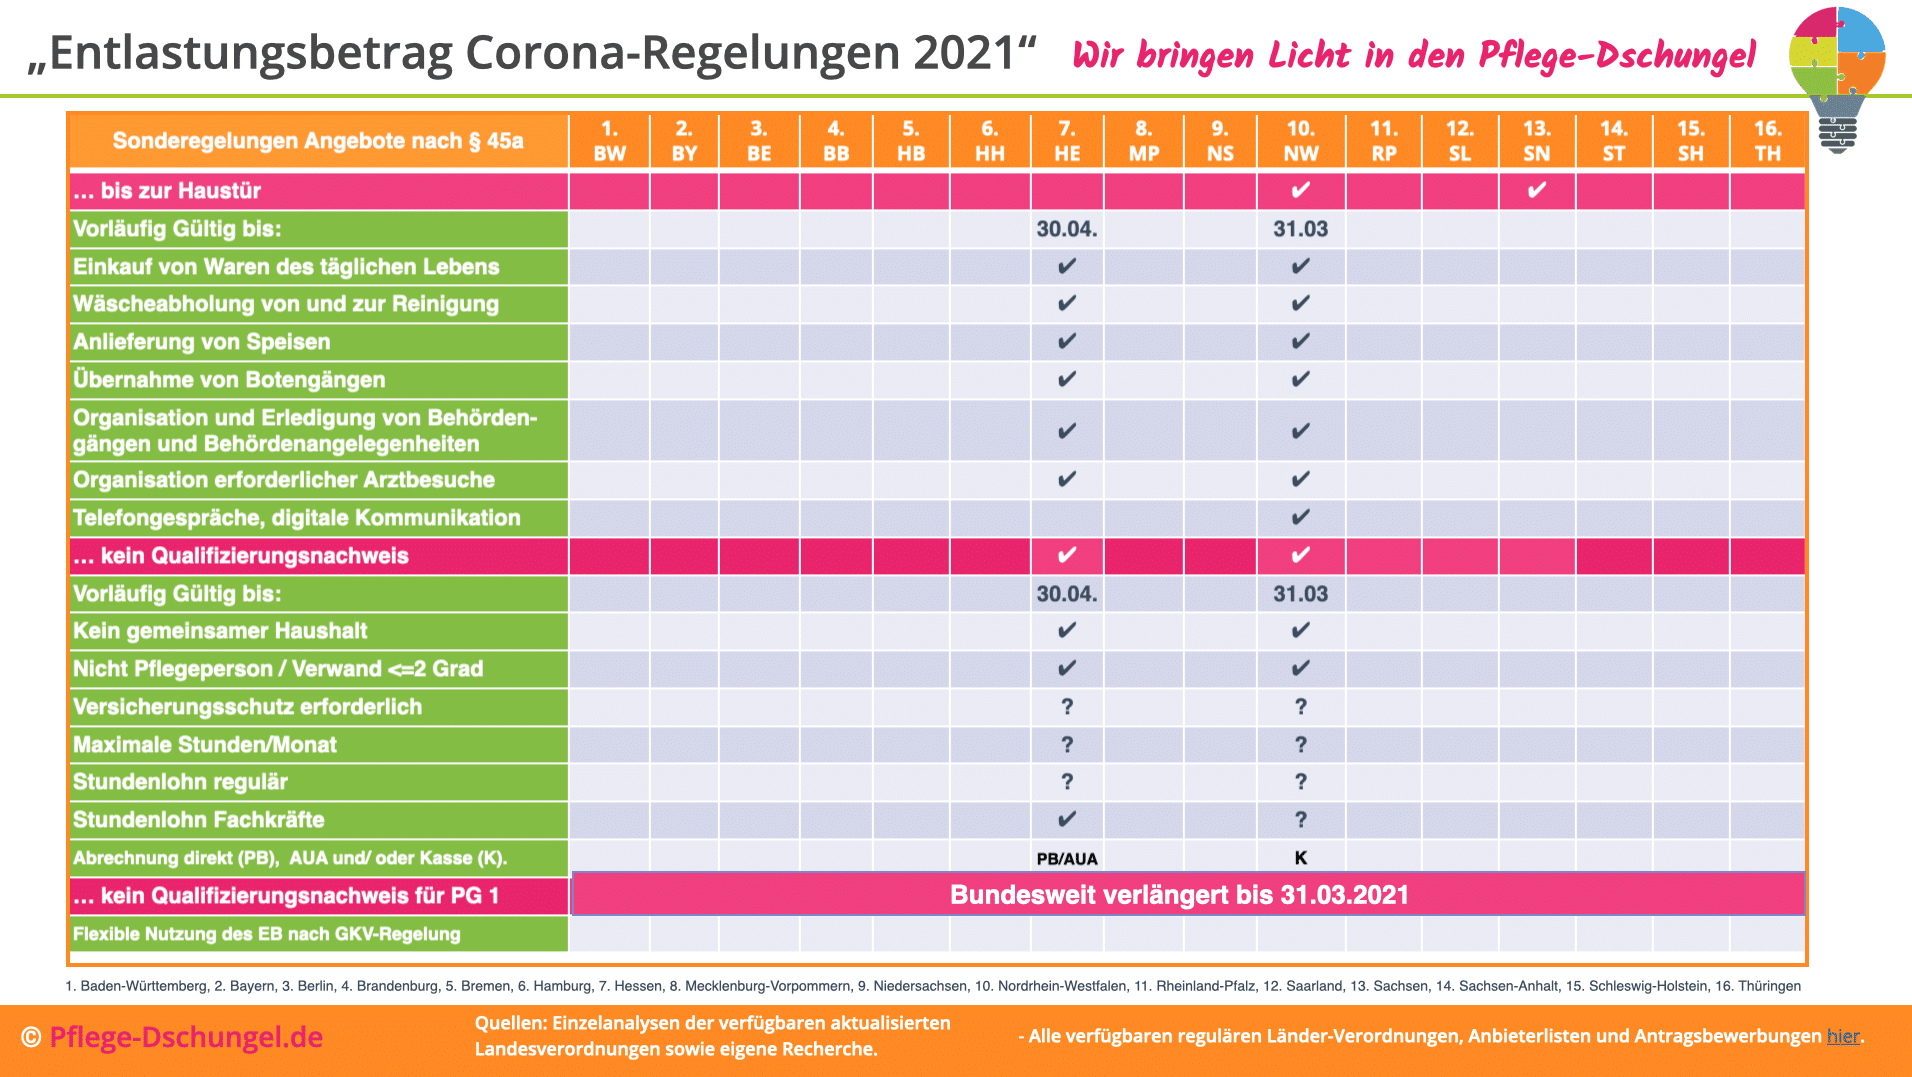 Update Entlastungsbetrag in Zeiten der Corona